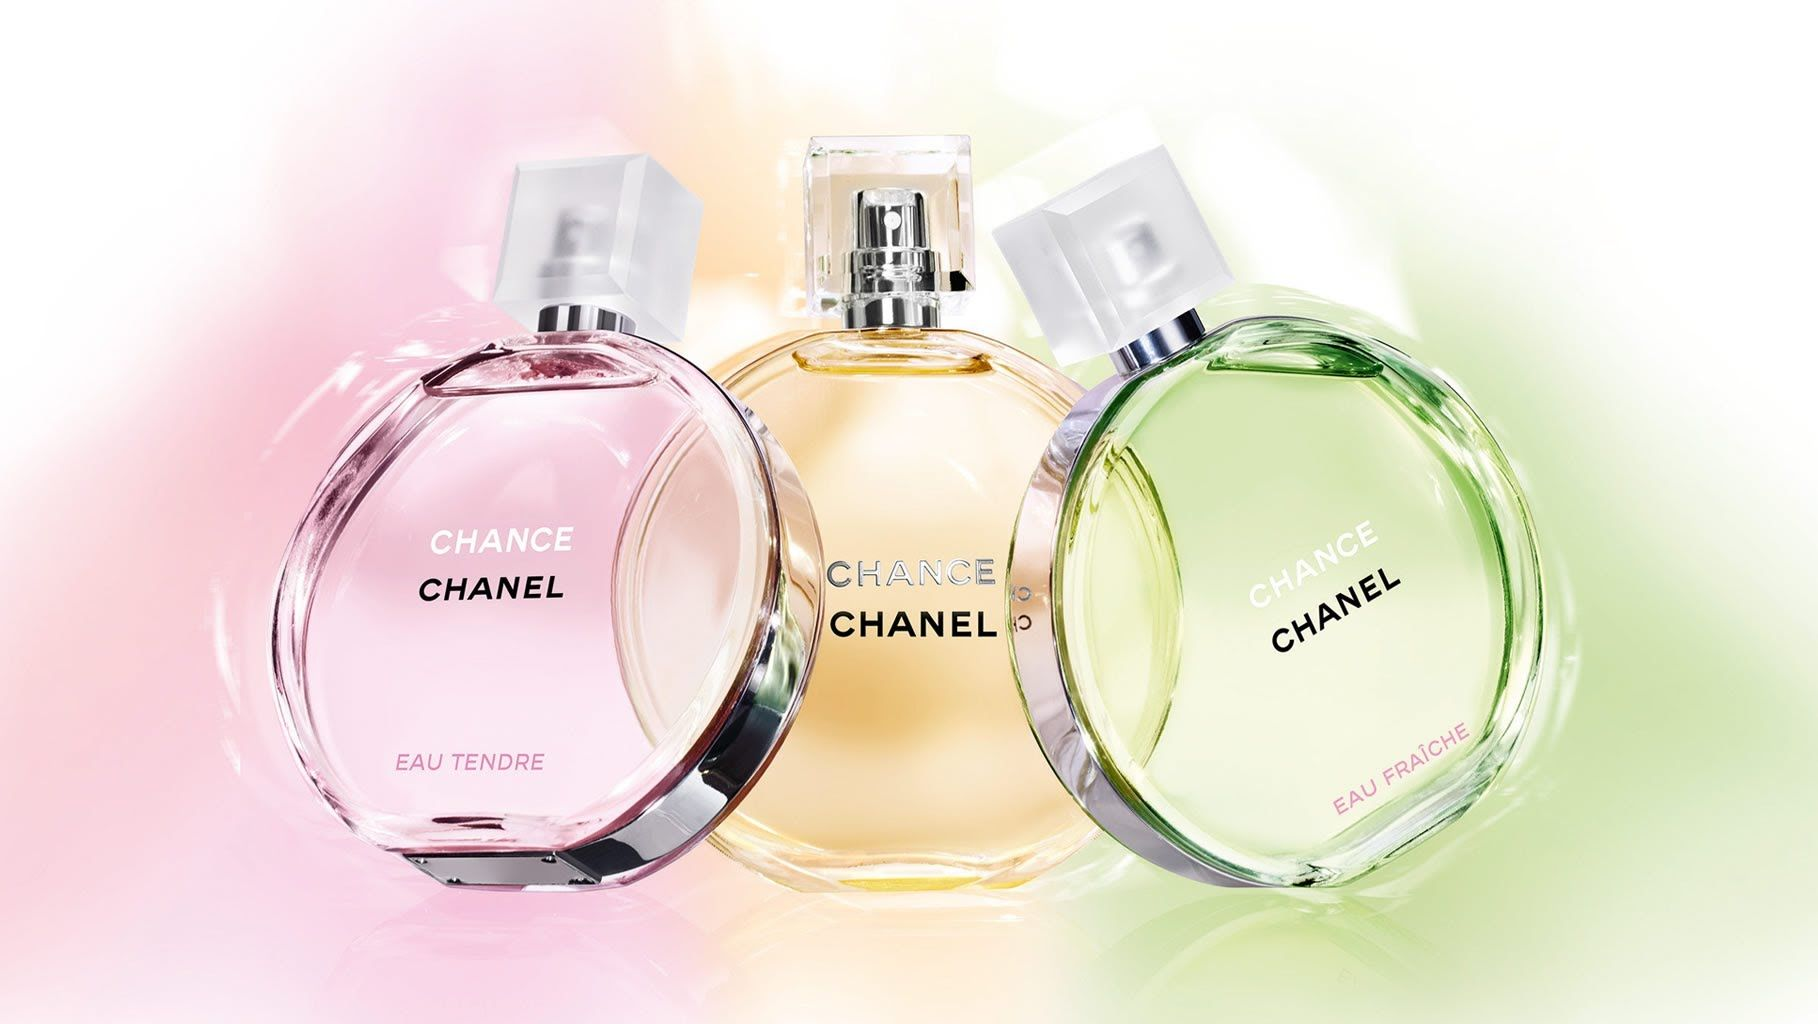 Chanel Chance Eau Tendre Fragrance Perfume Chanel Fragrance Chanel Cosmetics